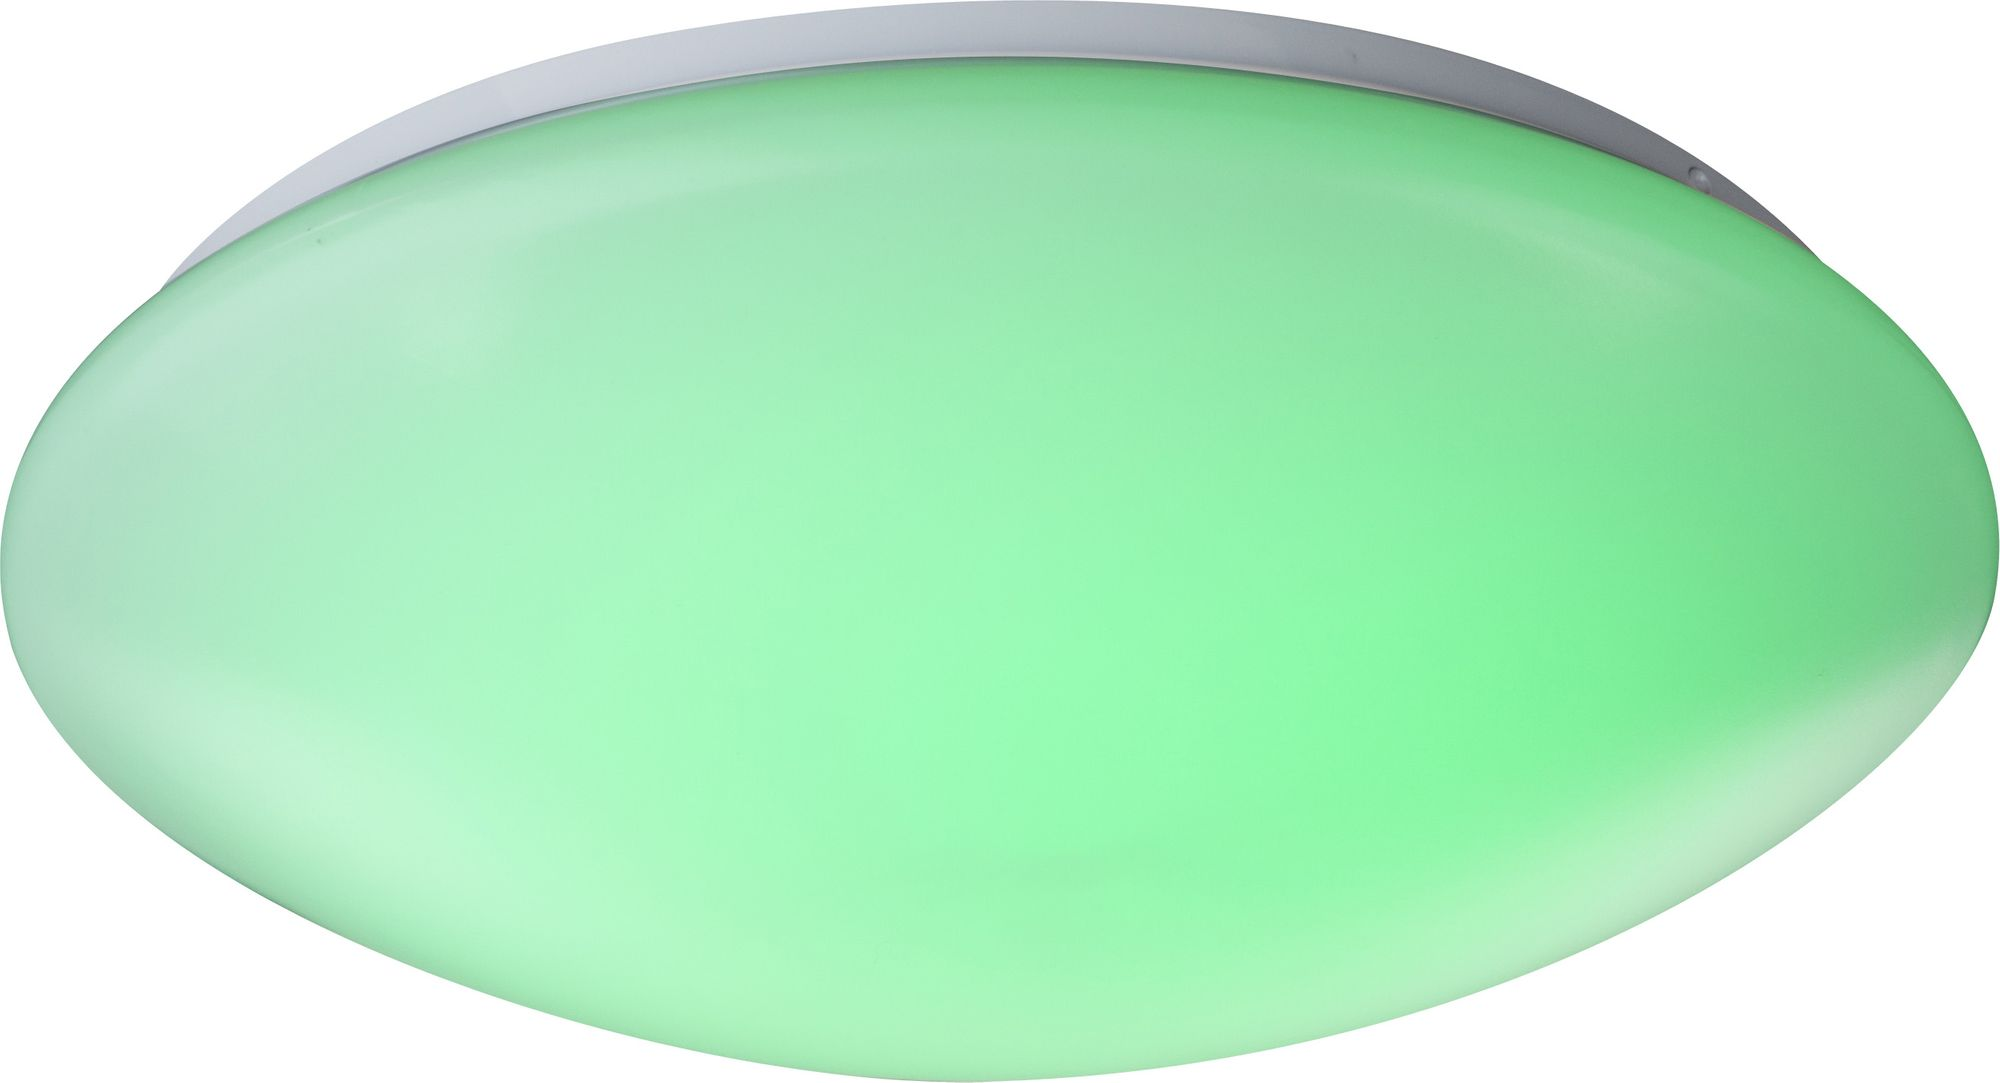 deckenlampe weiss acryl opal led dimmbar fernbedienung farbwechsler farben fixierbar. Black Bedroom Furniture Sets. Home Design Ideas